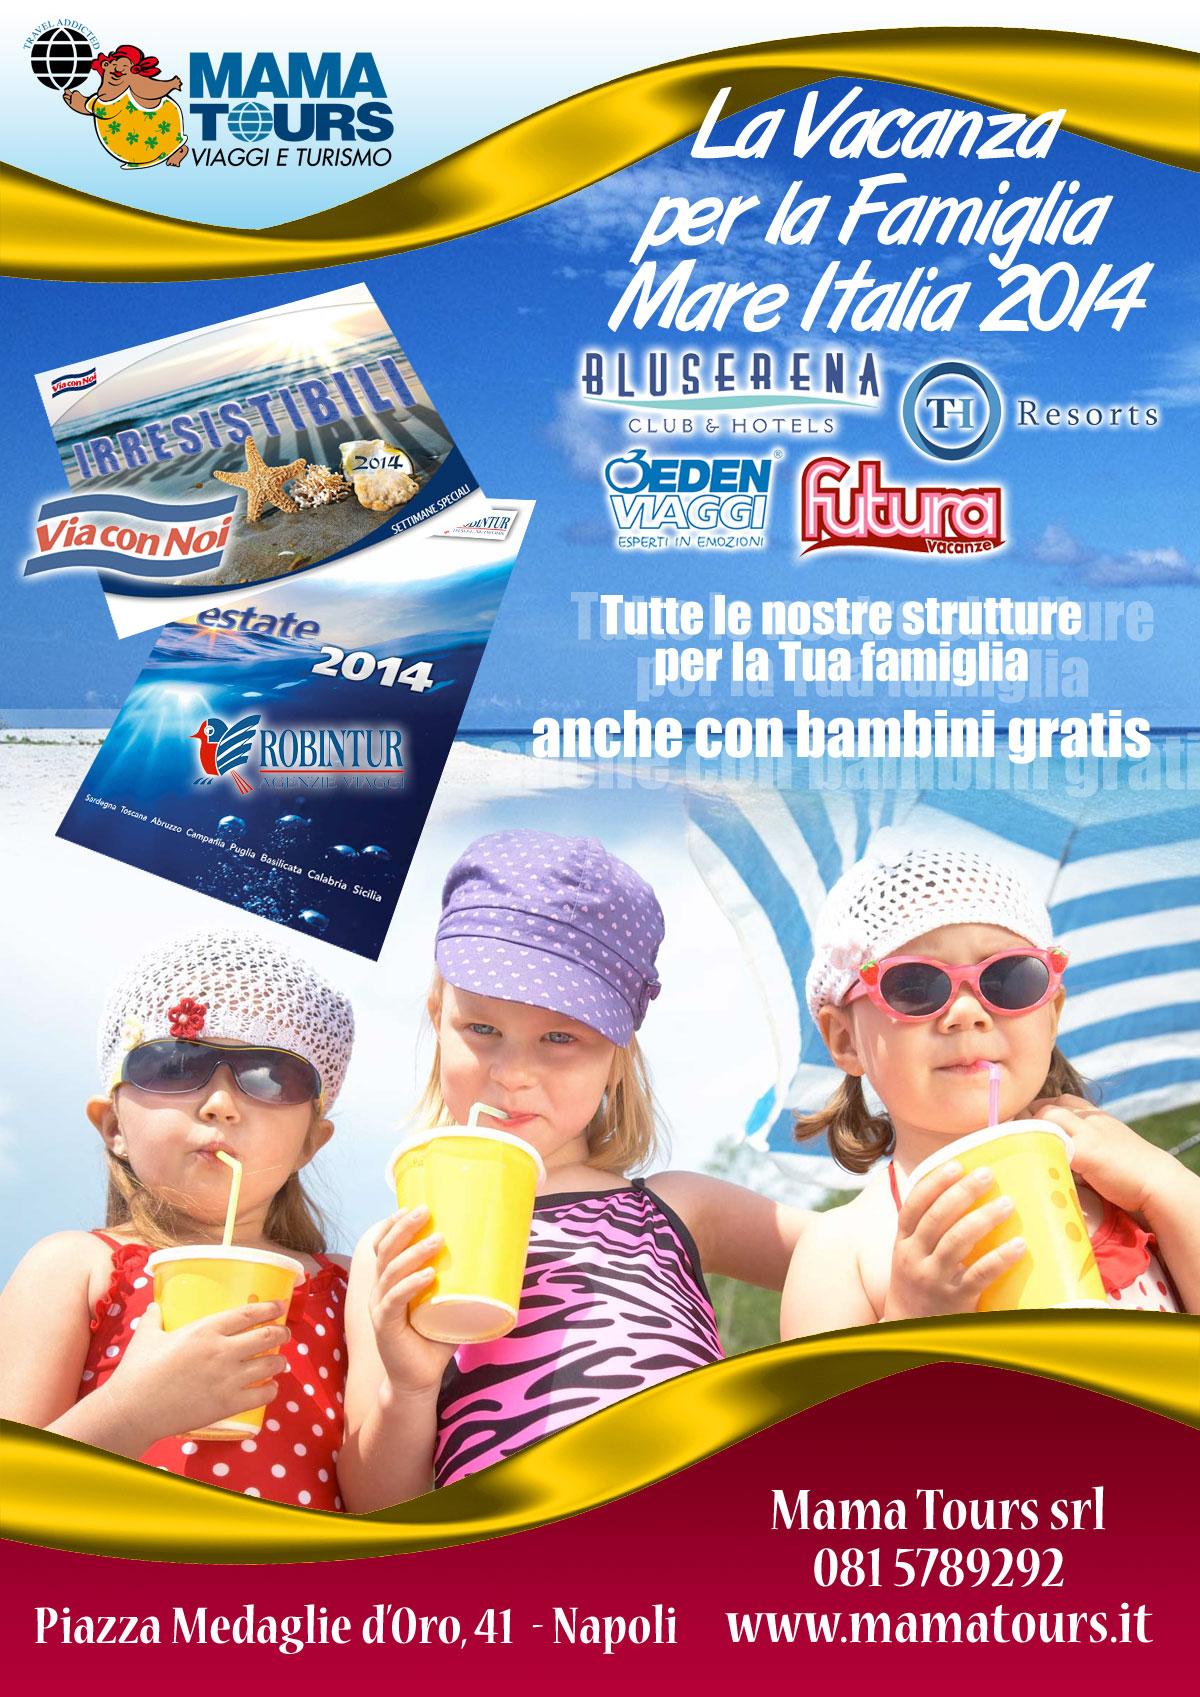 Mamatours Estate 2014 Famiglie  Ecommerce Gestione Ecommerce  Ecommerce